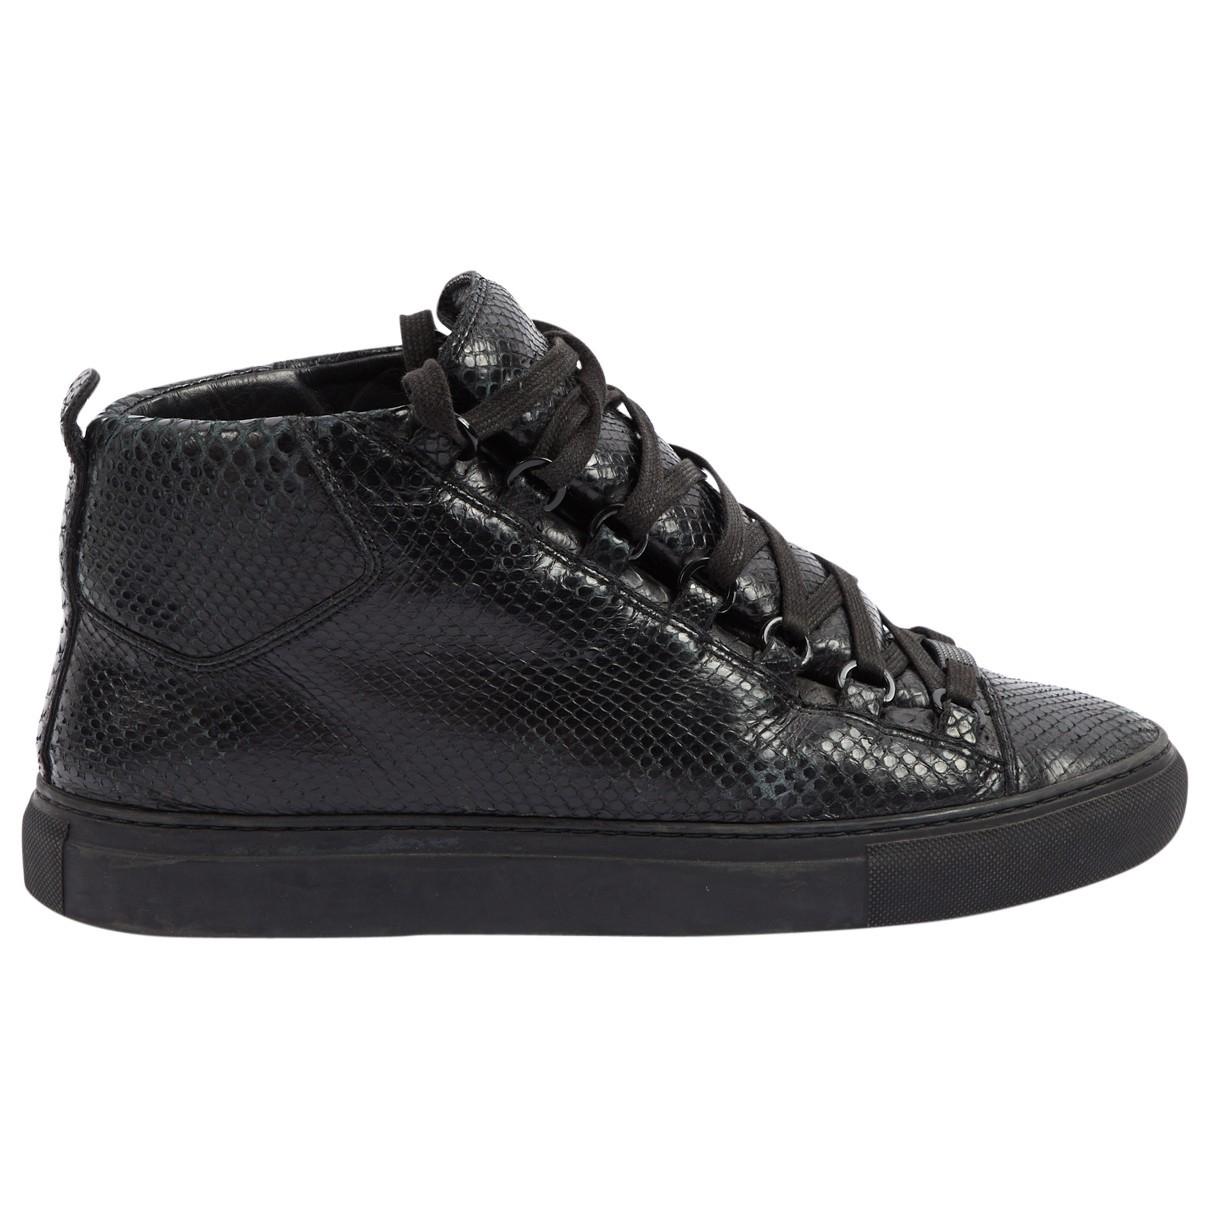 Balenciaga \N Black Leather Lace ups for Women 40 EU